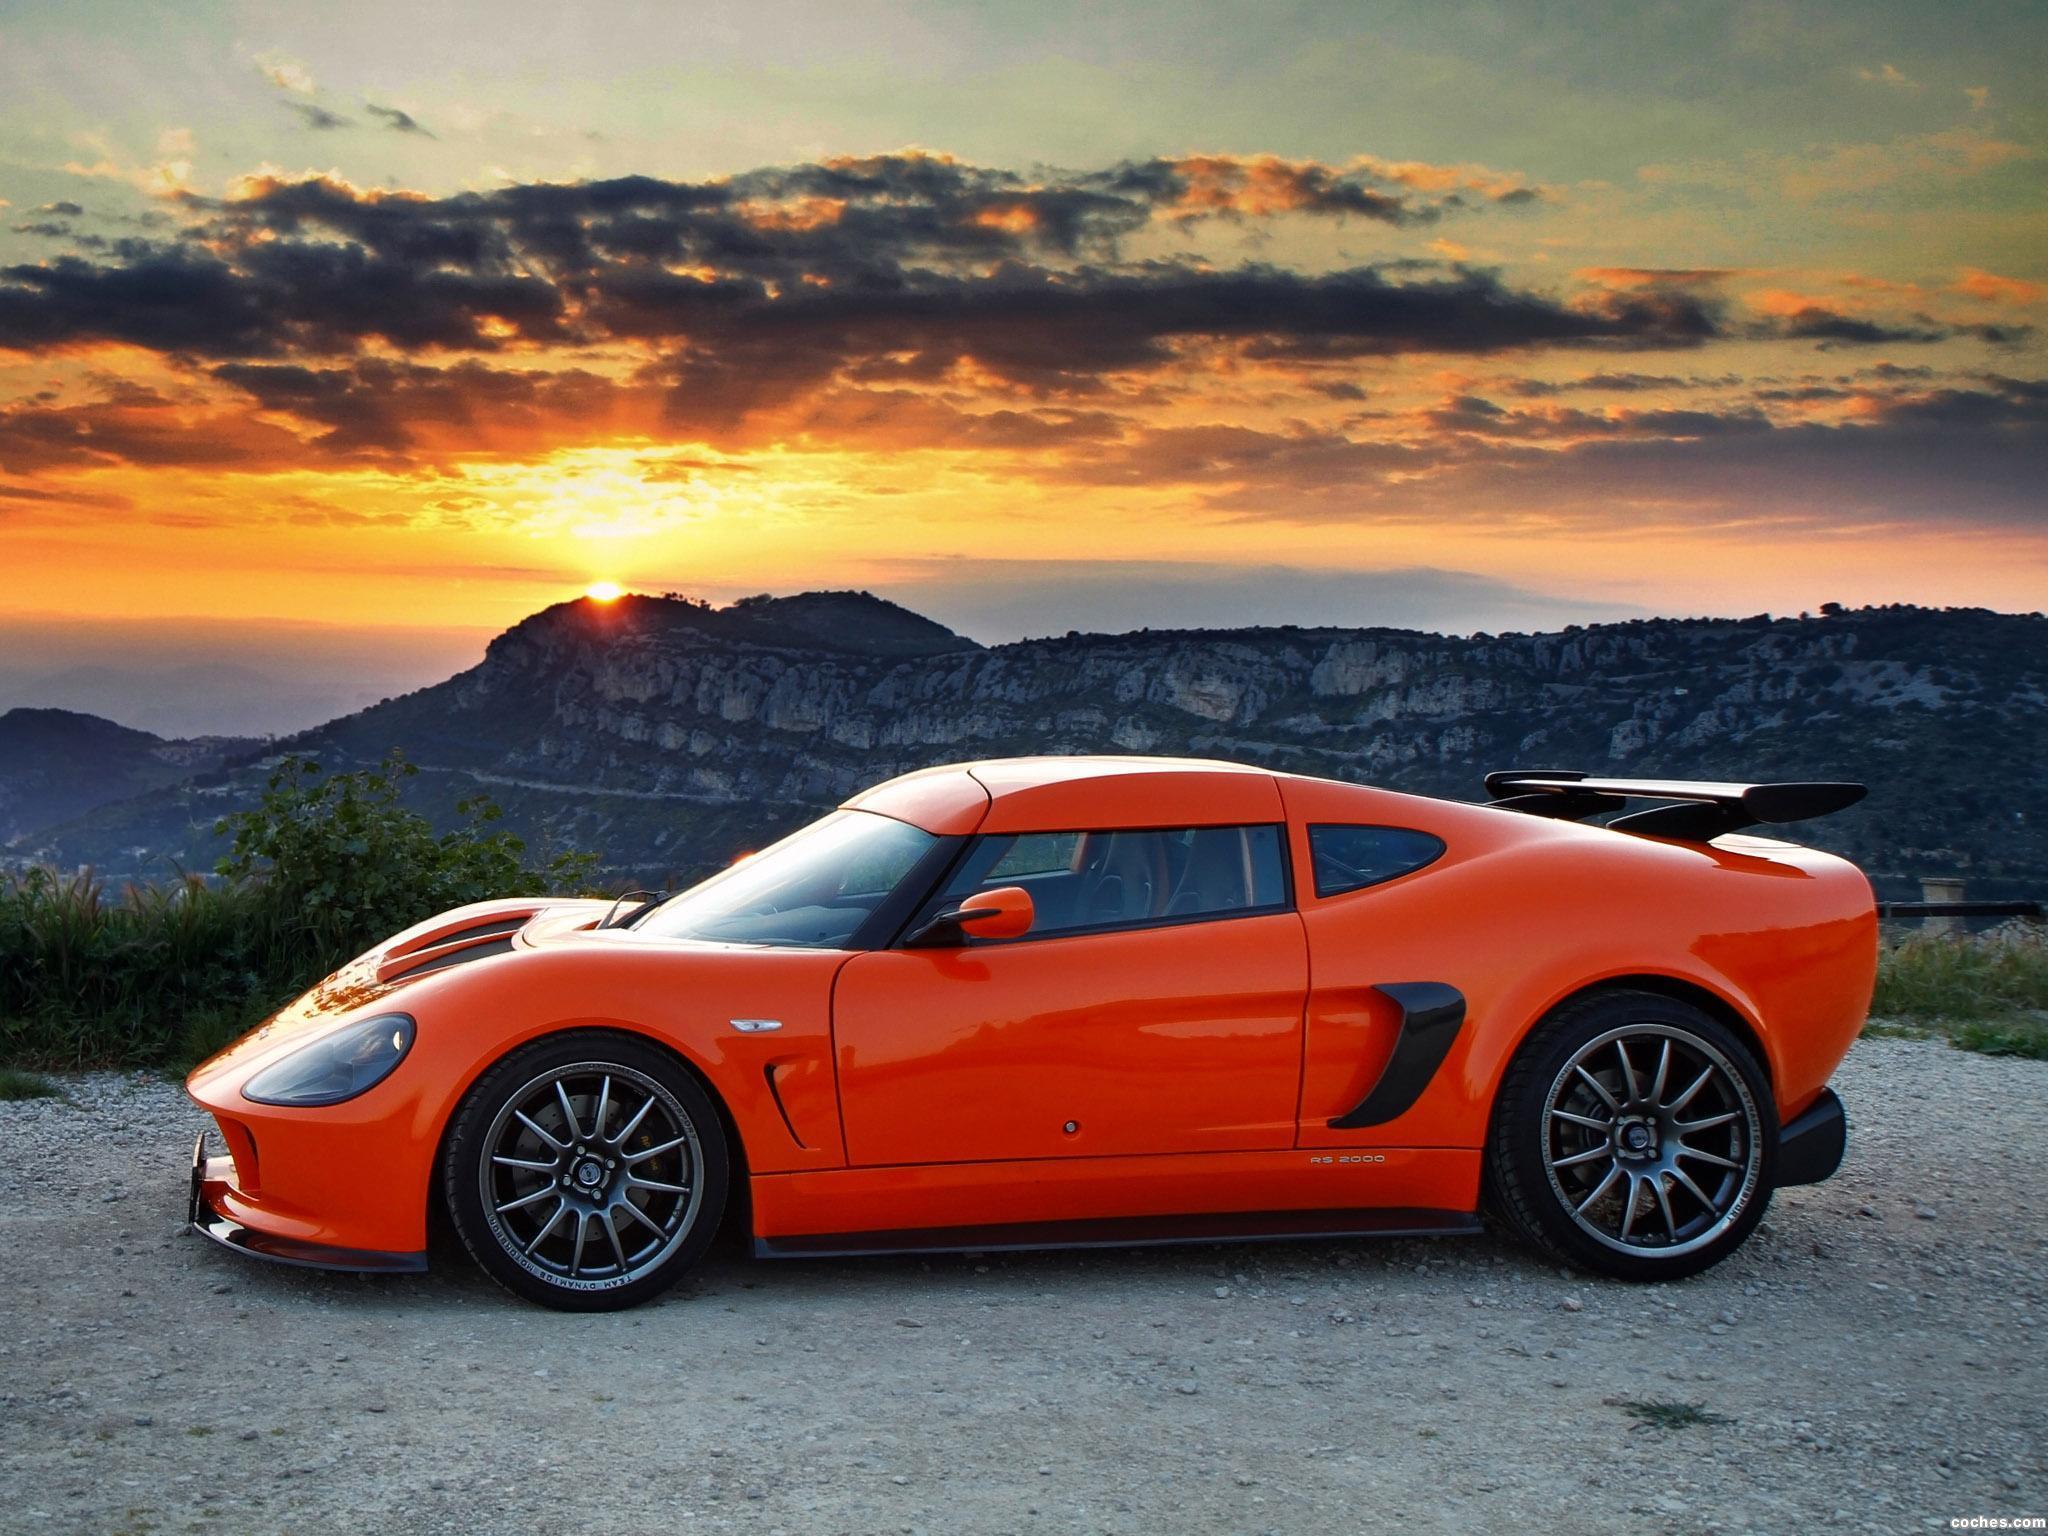 Foto 2 de Melkus RS2000 GTS 2011